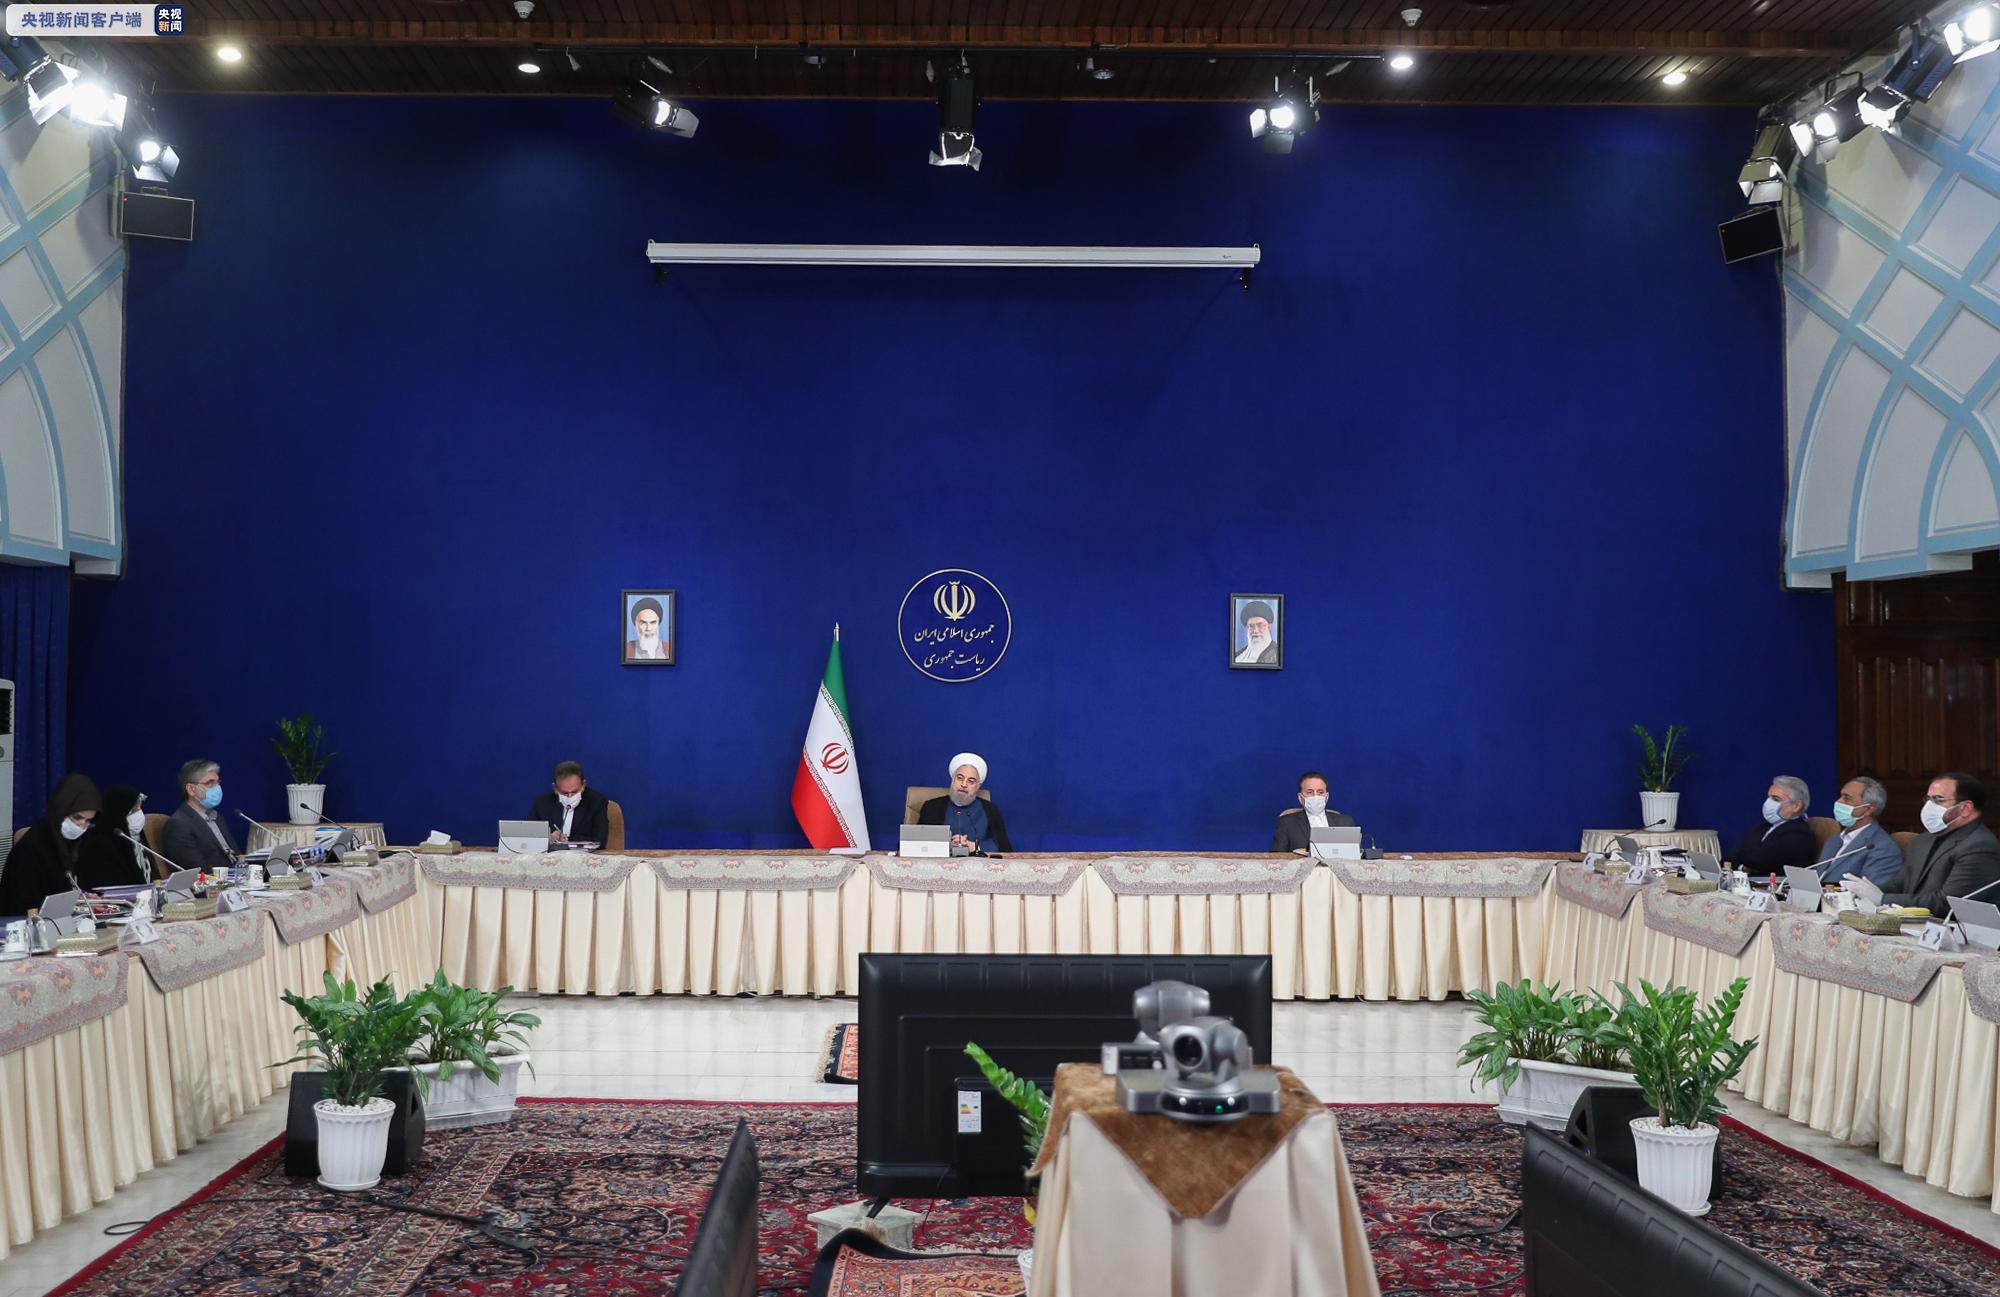 【nano是什么】_伊朗总统:美国若采取任何行动 将面临伊朗决定性回应